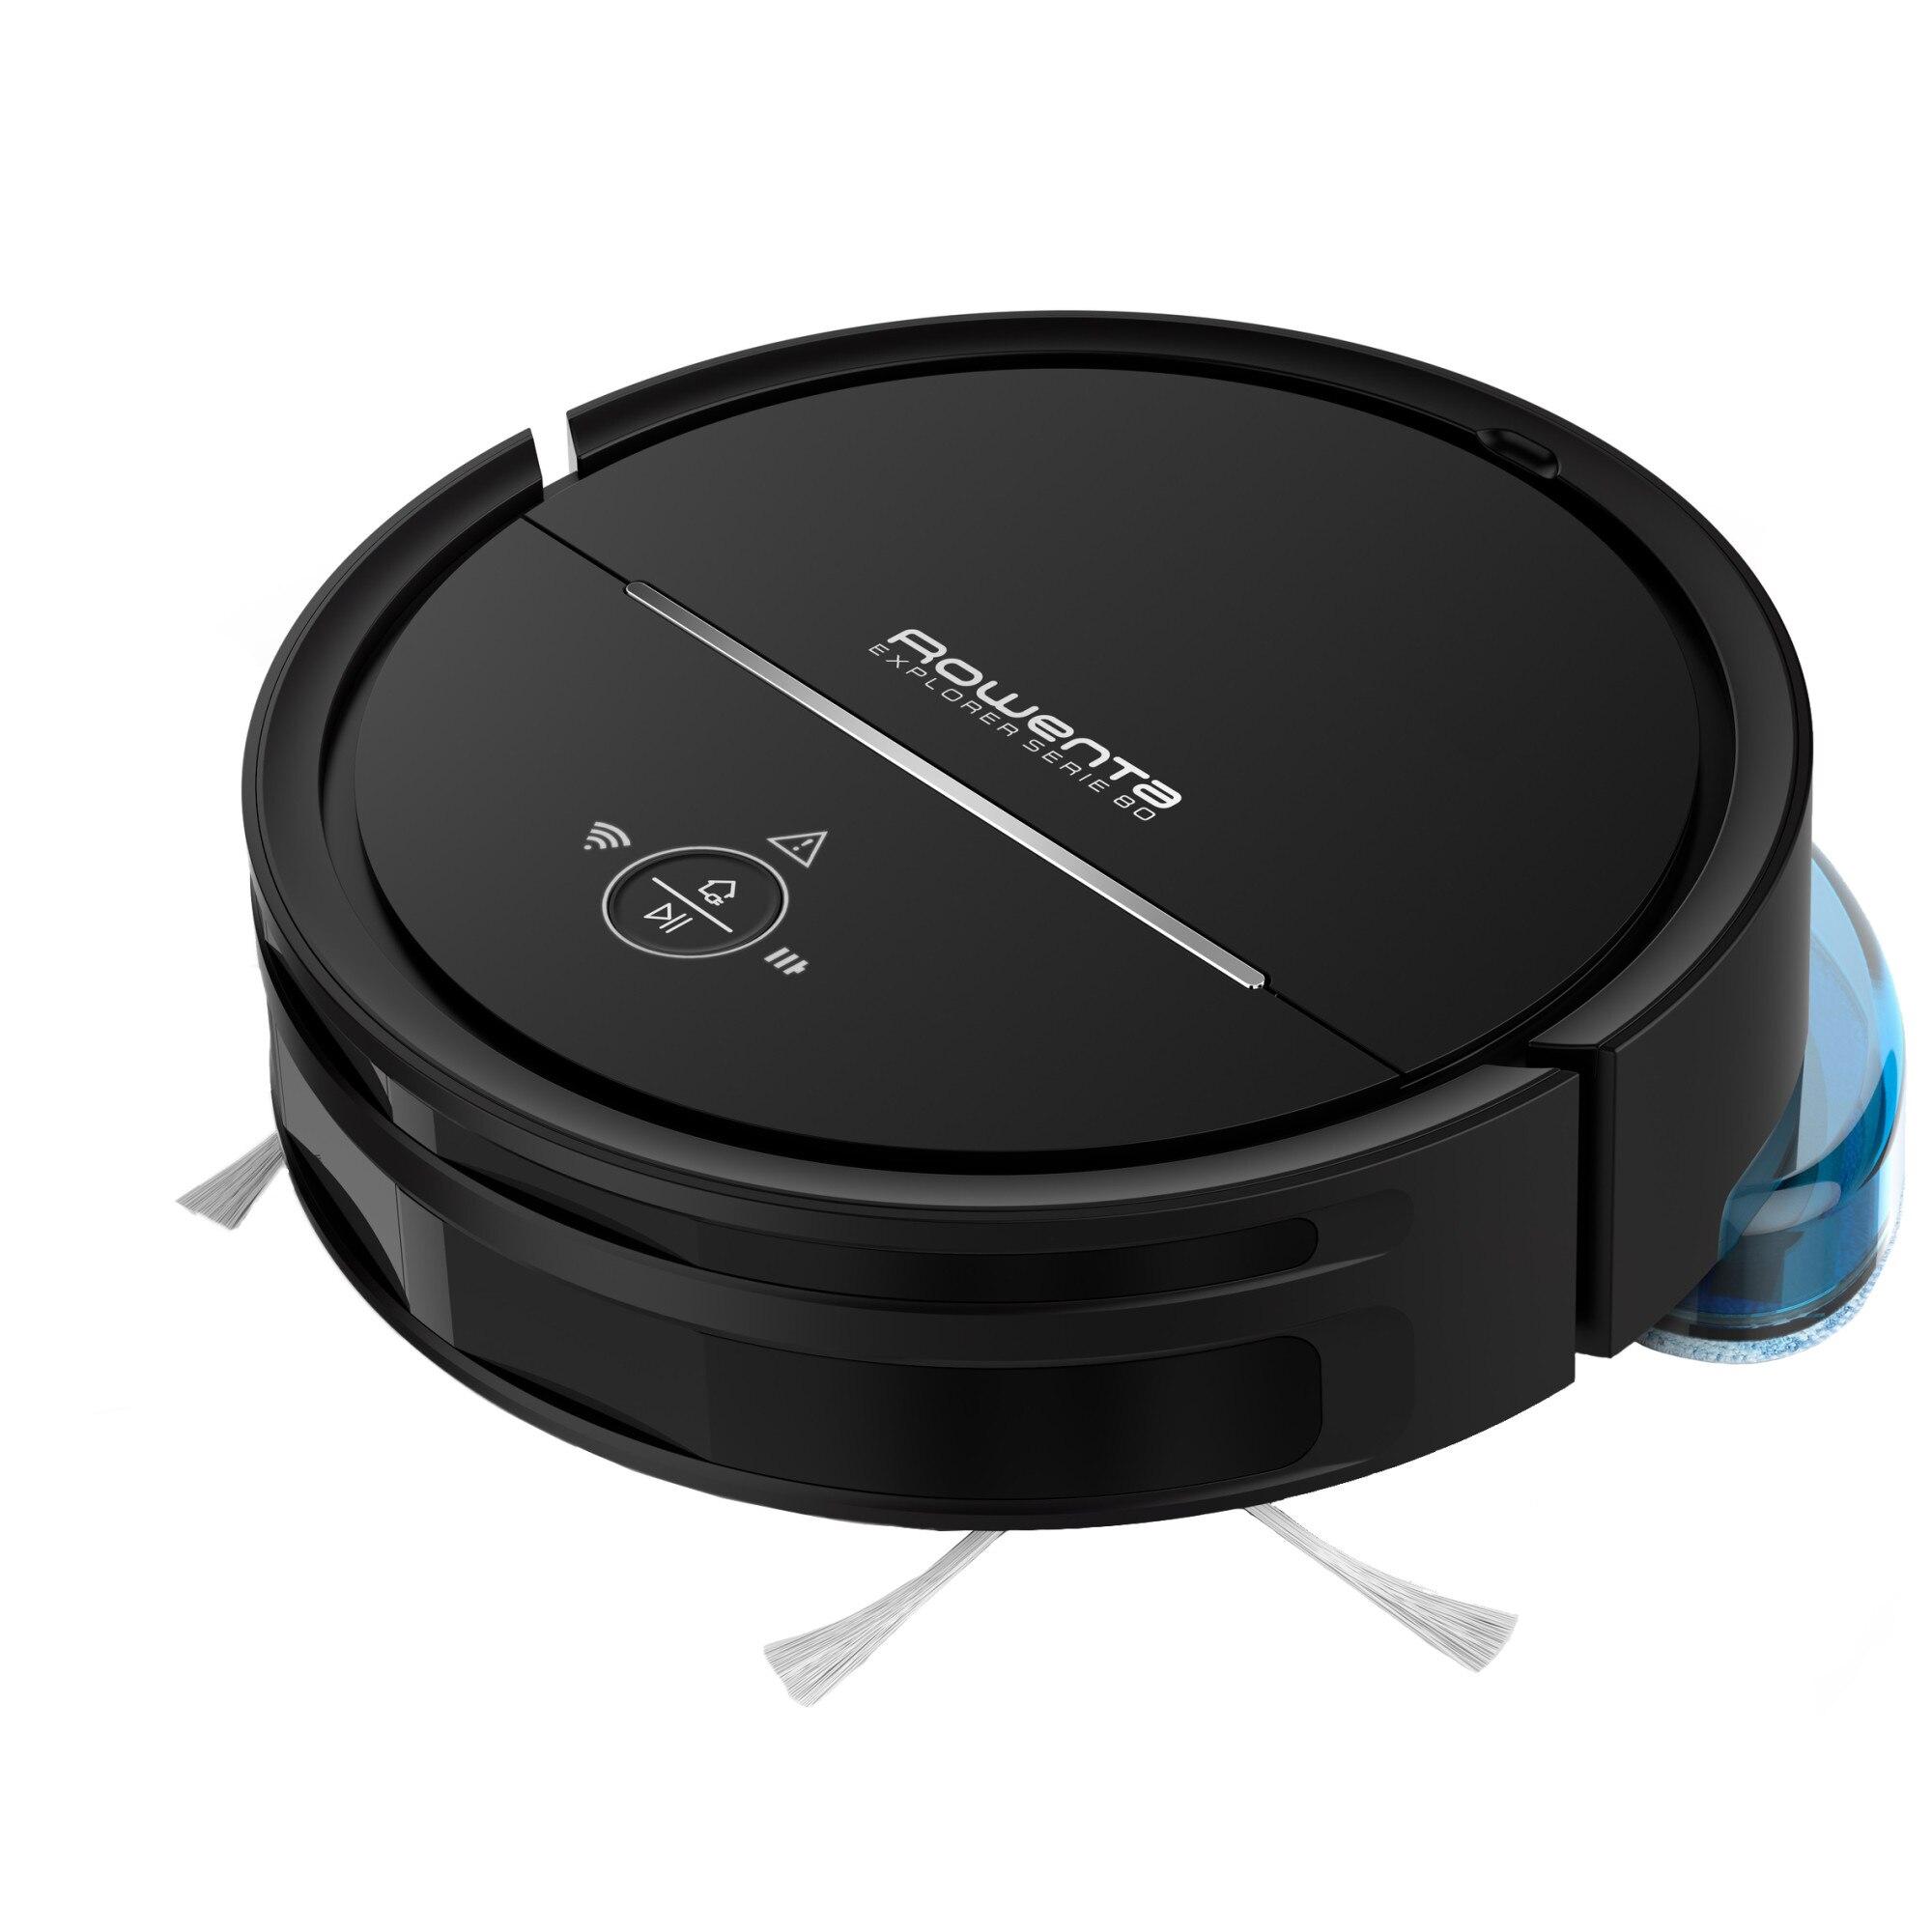 Fotografie Aspirator robot ROWENTA X-Plorer Animal Serie 80 RR7755WH, 33W, recipient 0.7l, 3 functii de curatare, compatibil cu smartphone-ul, Sistem Aqua Force, negru